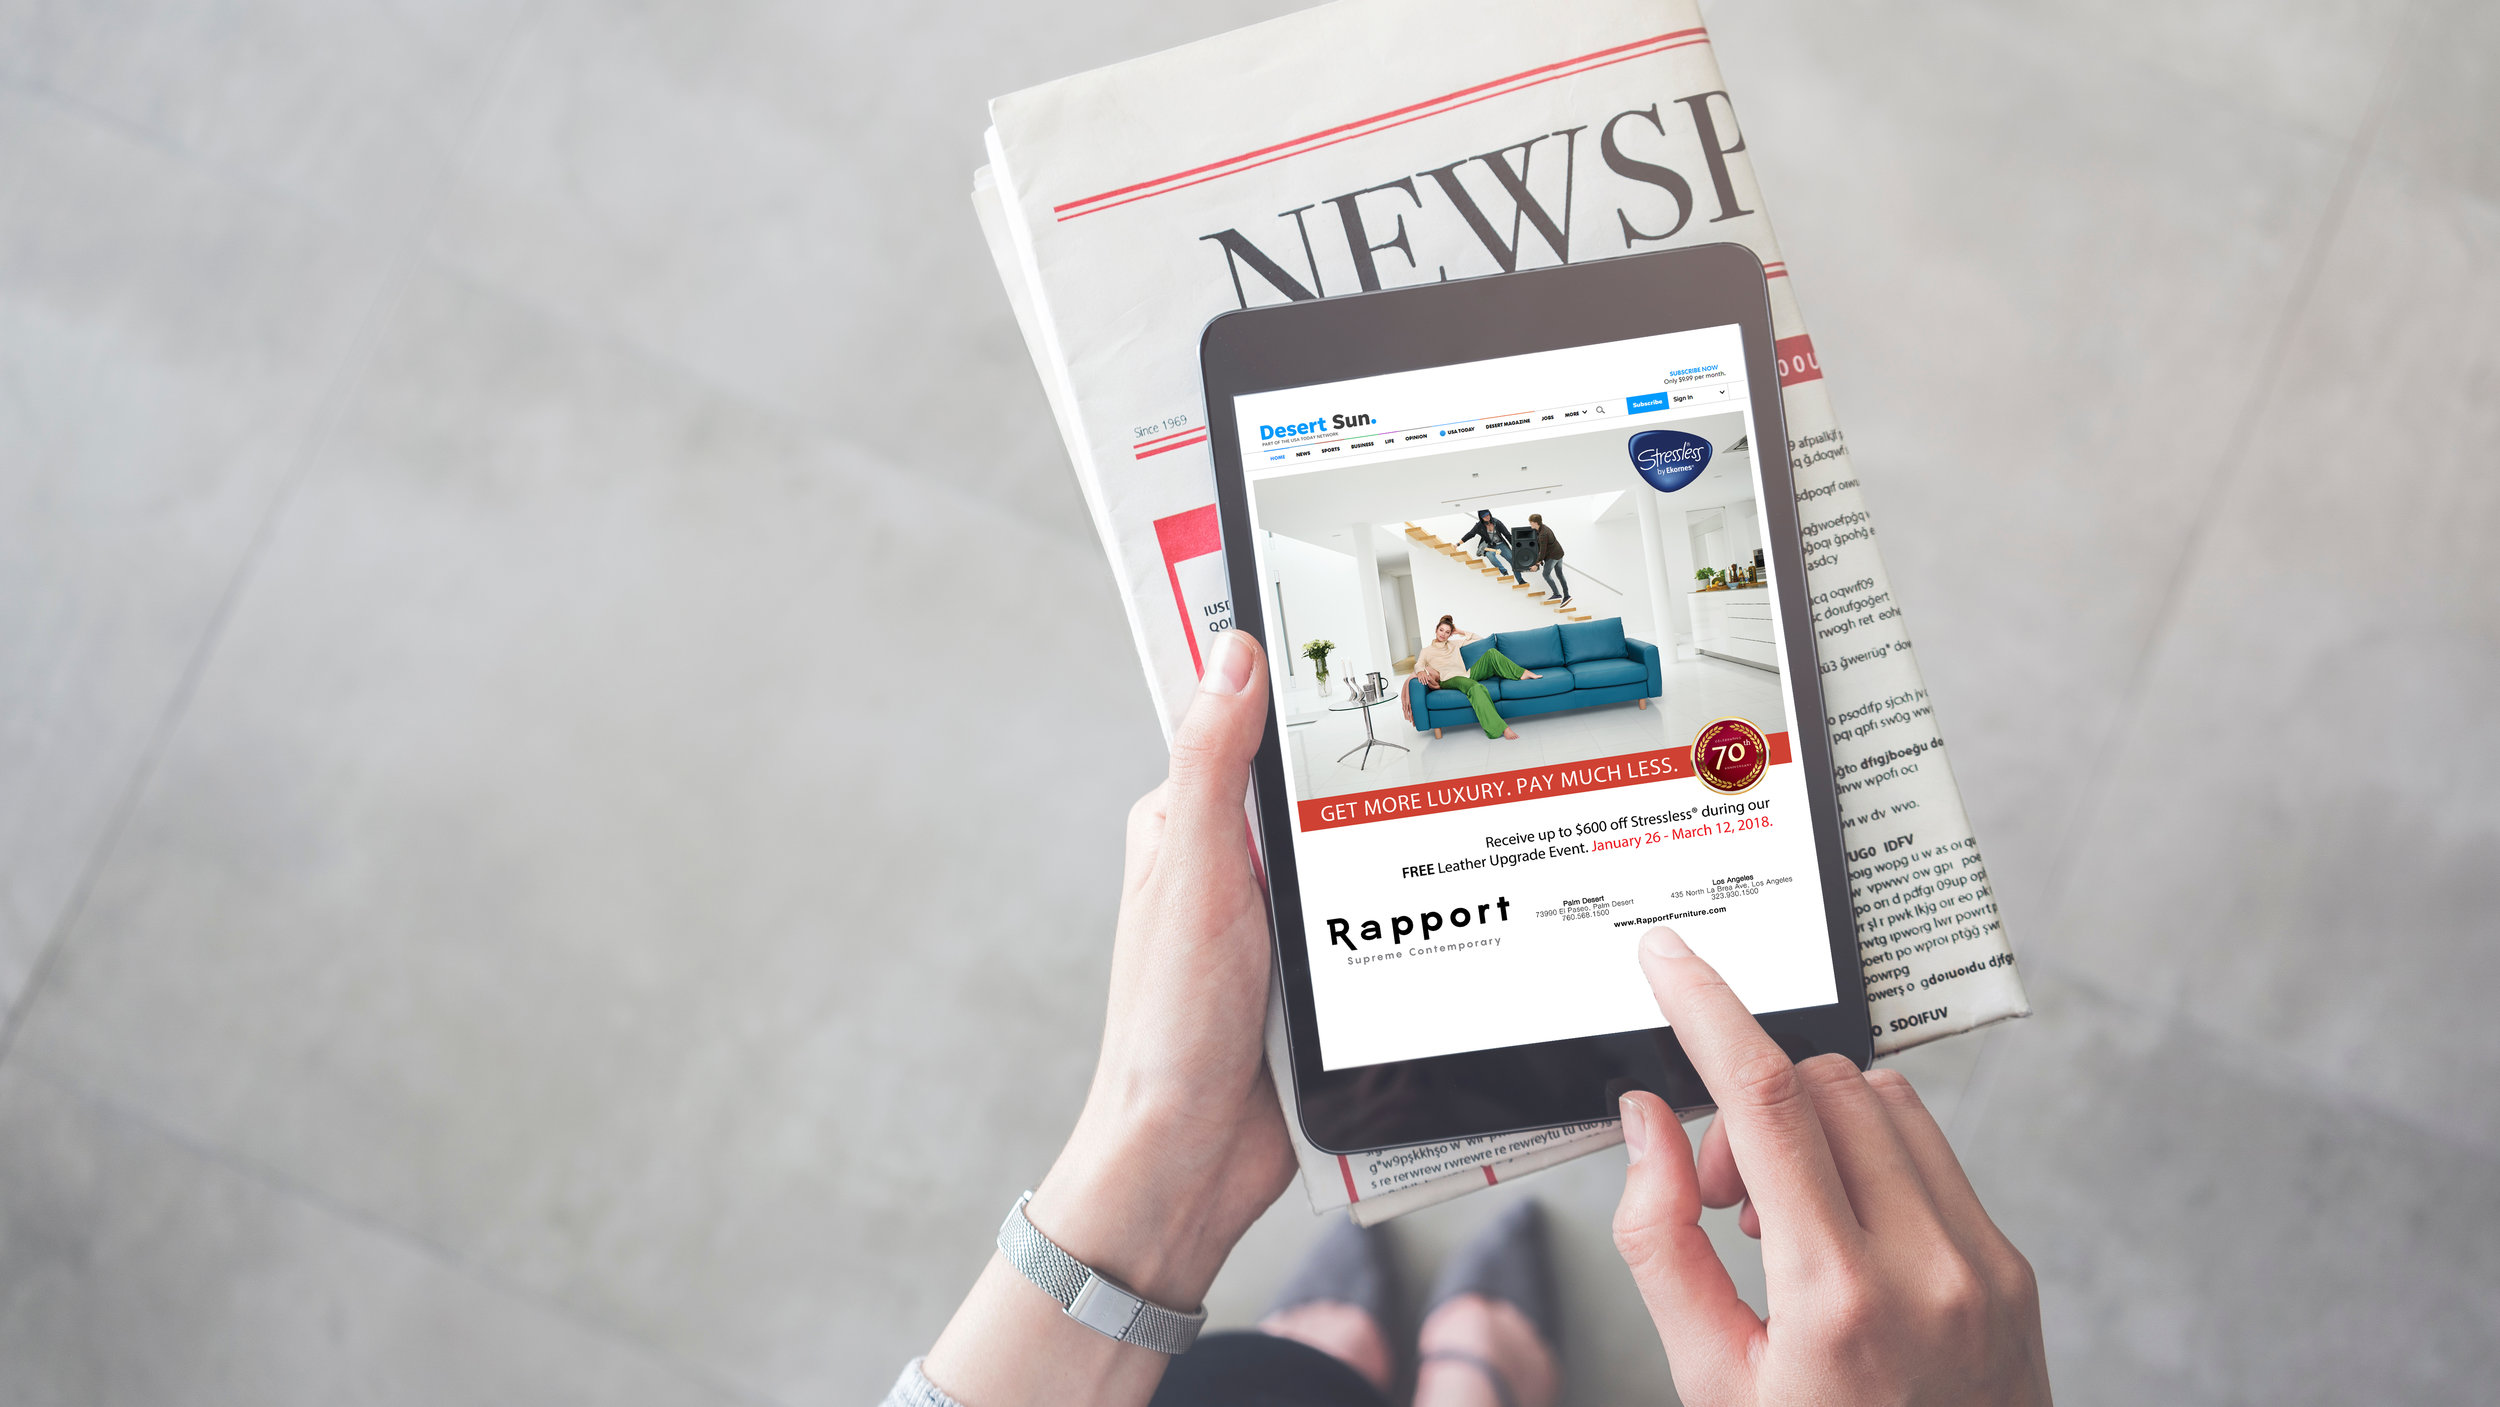 Rapport_DesertSunNewspaper_IPAD8.jpg